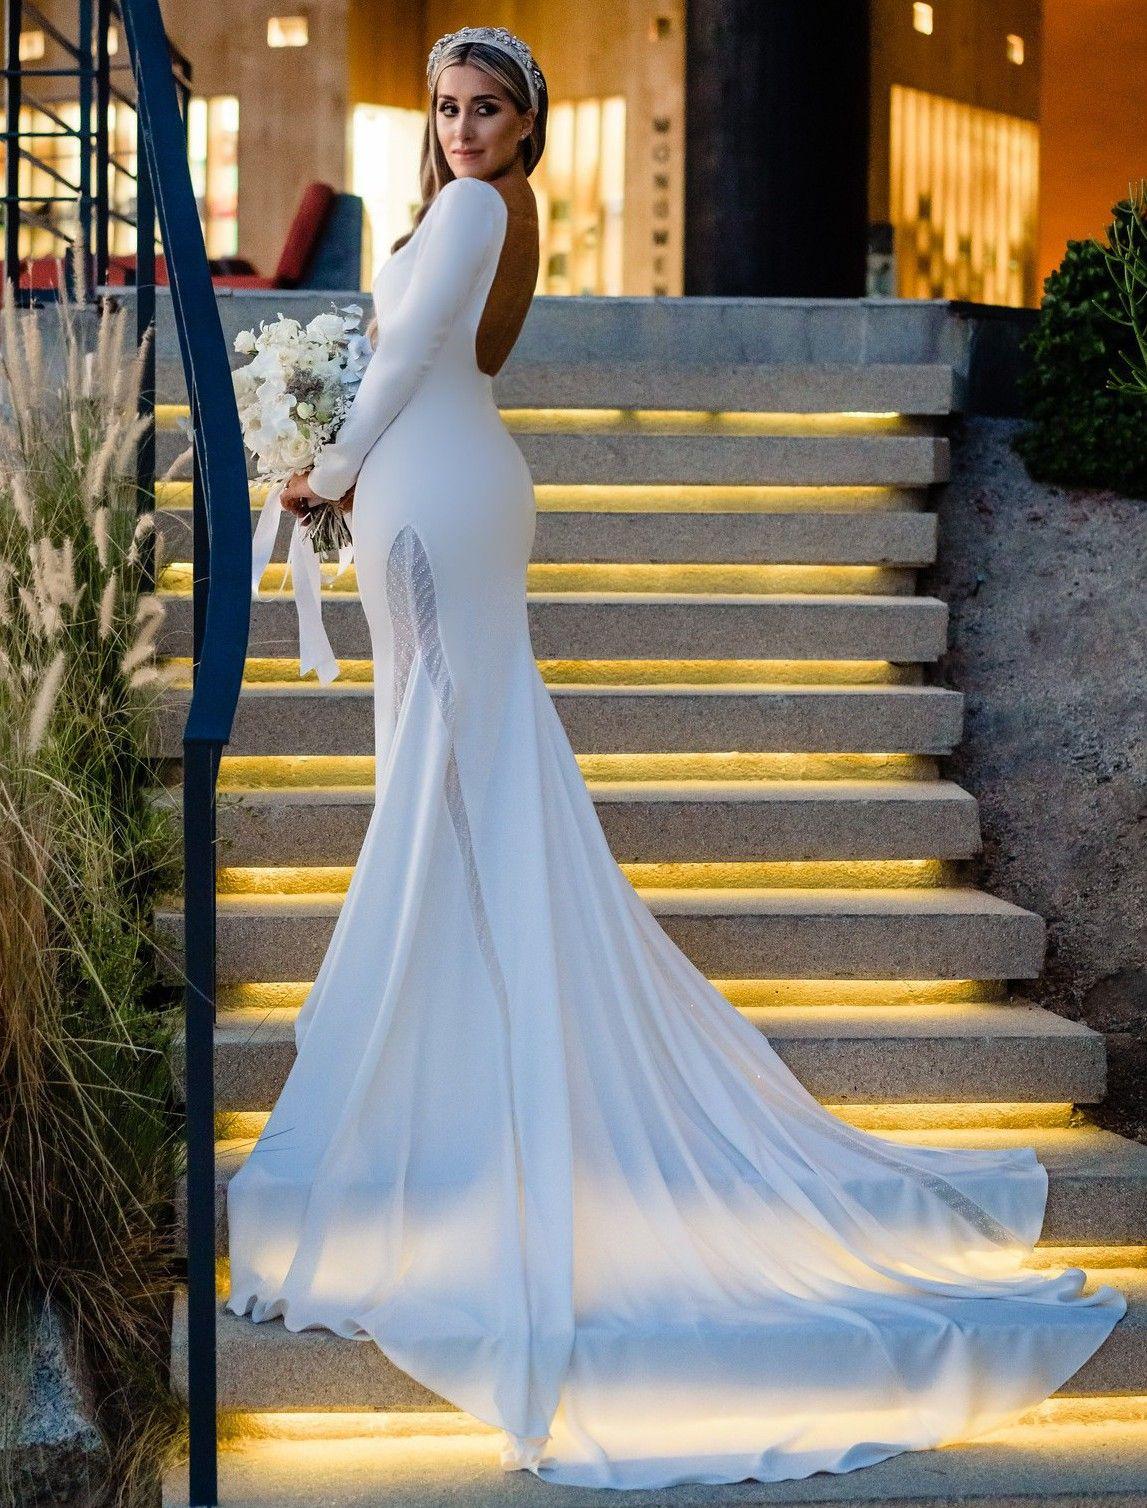 Pronovias New Bianca 2020 Collection New Wedding Dress Save 50 New Wedding Dresses Wedding Dresses Pronovias Wedding Dress [ 1508 x 1147 Pixel ]